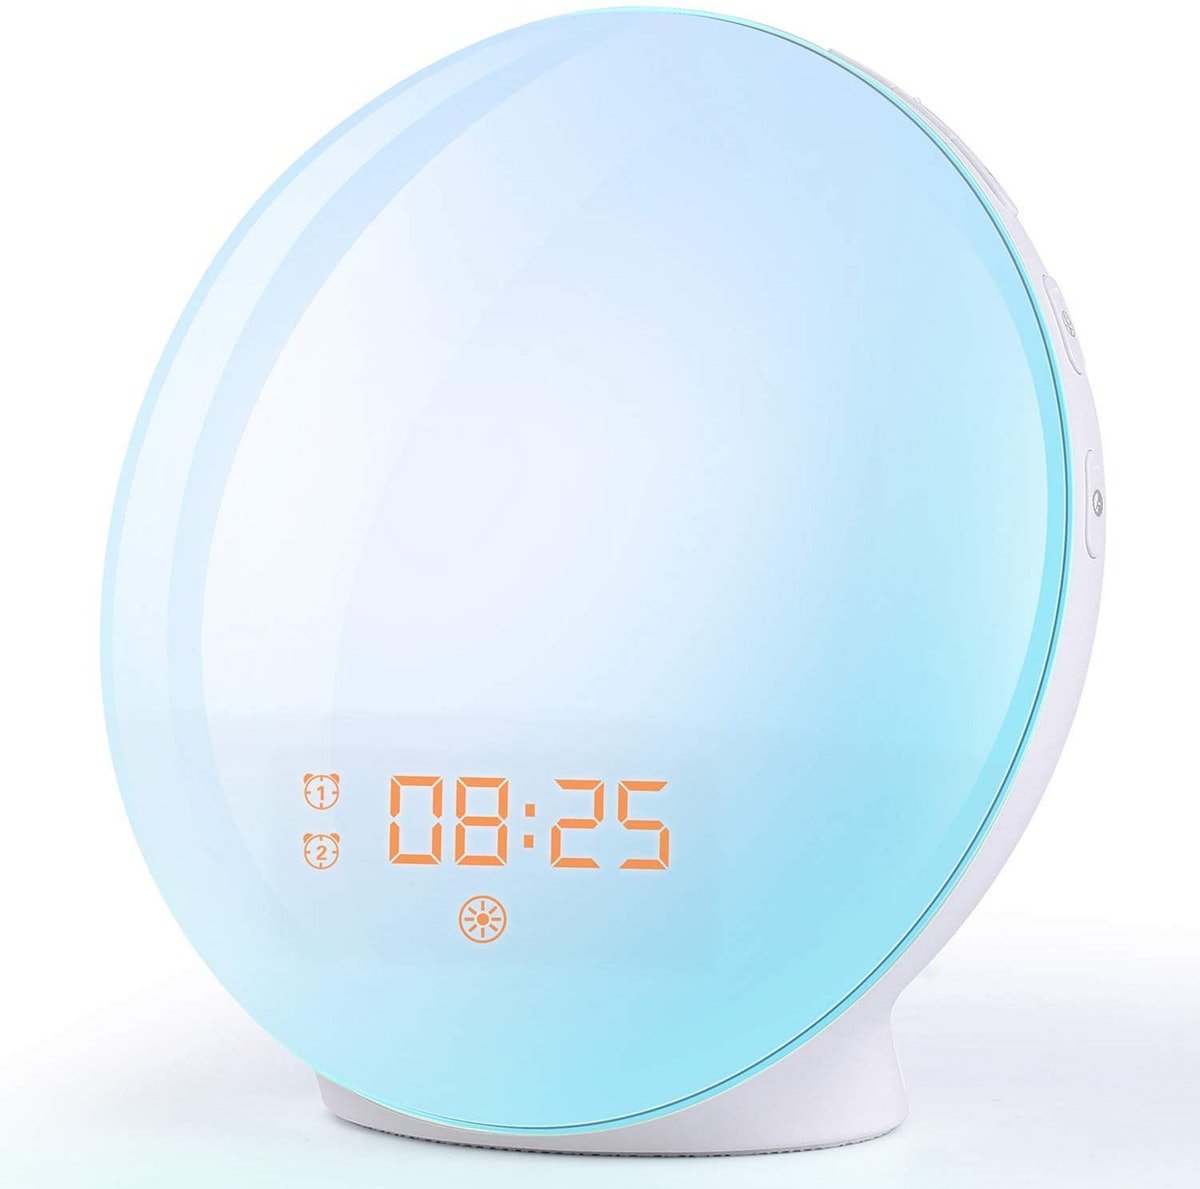 FITFORT Wake Up Light Alarm Clock